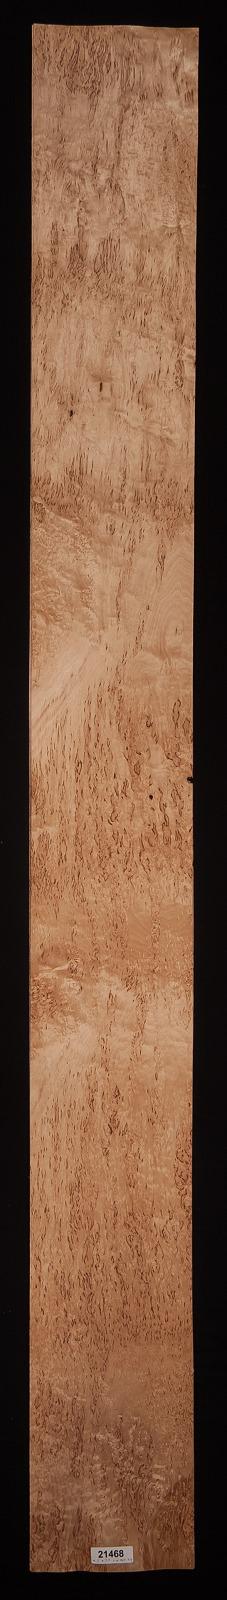 AAA Karelian Birch Burl Veneer Sheet